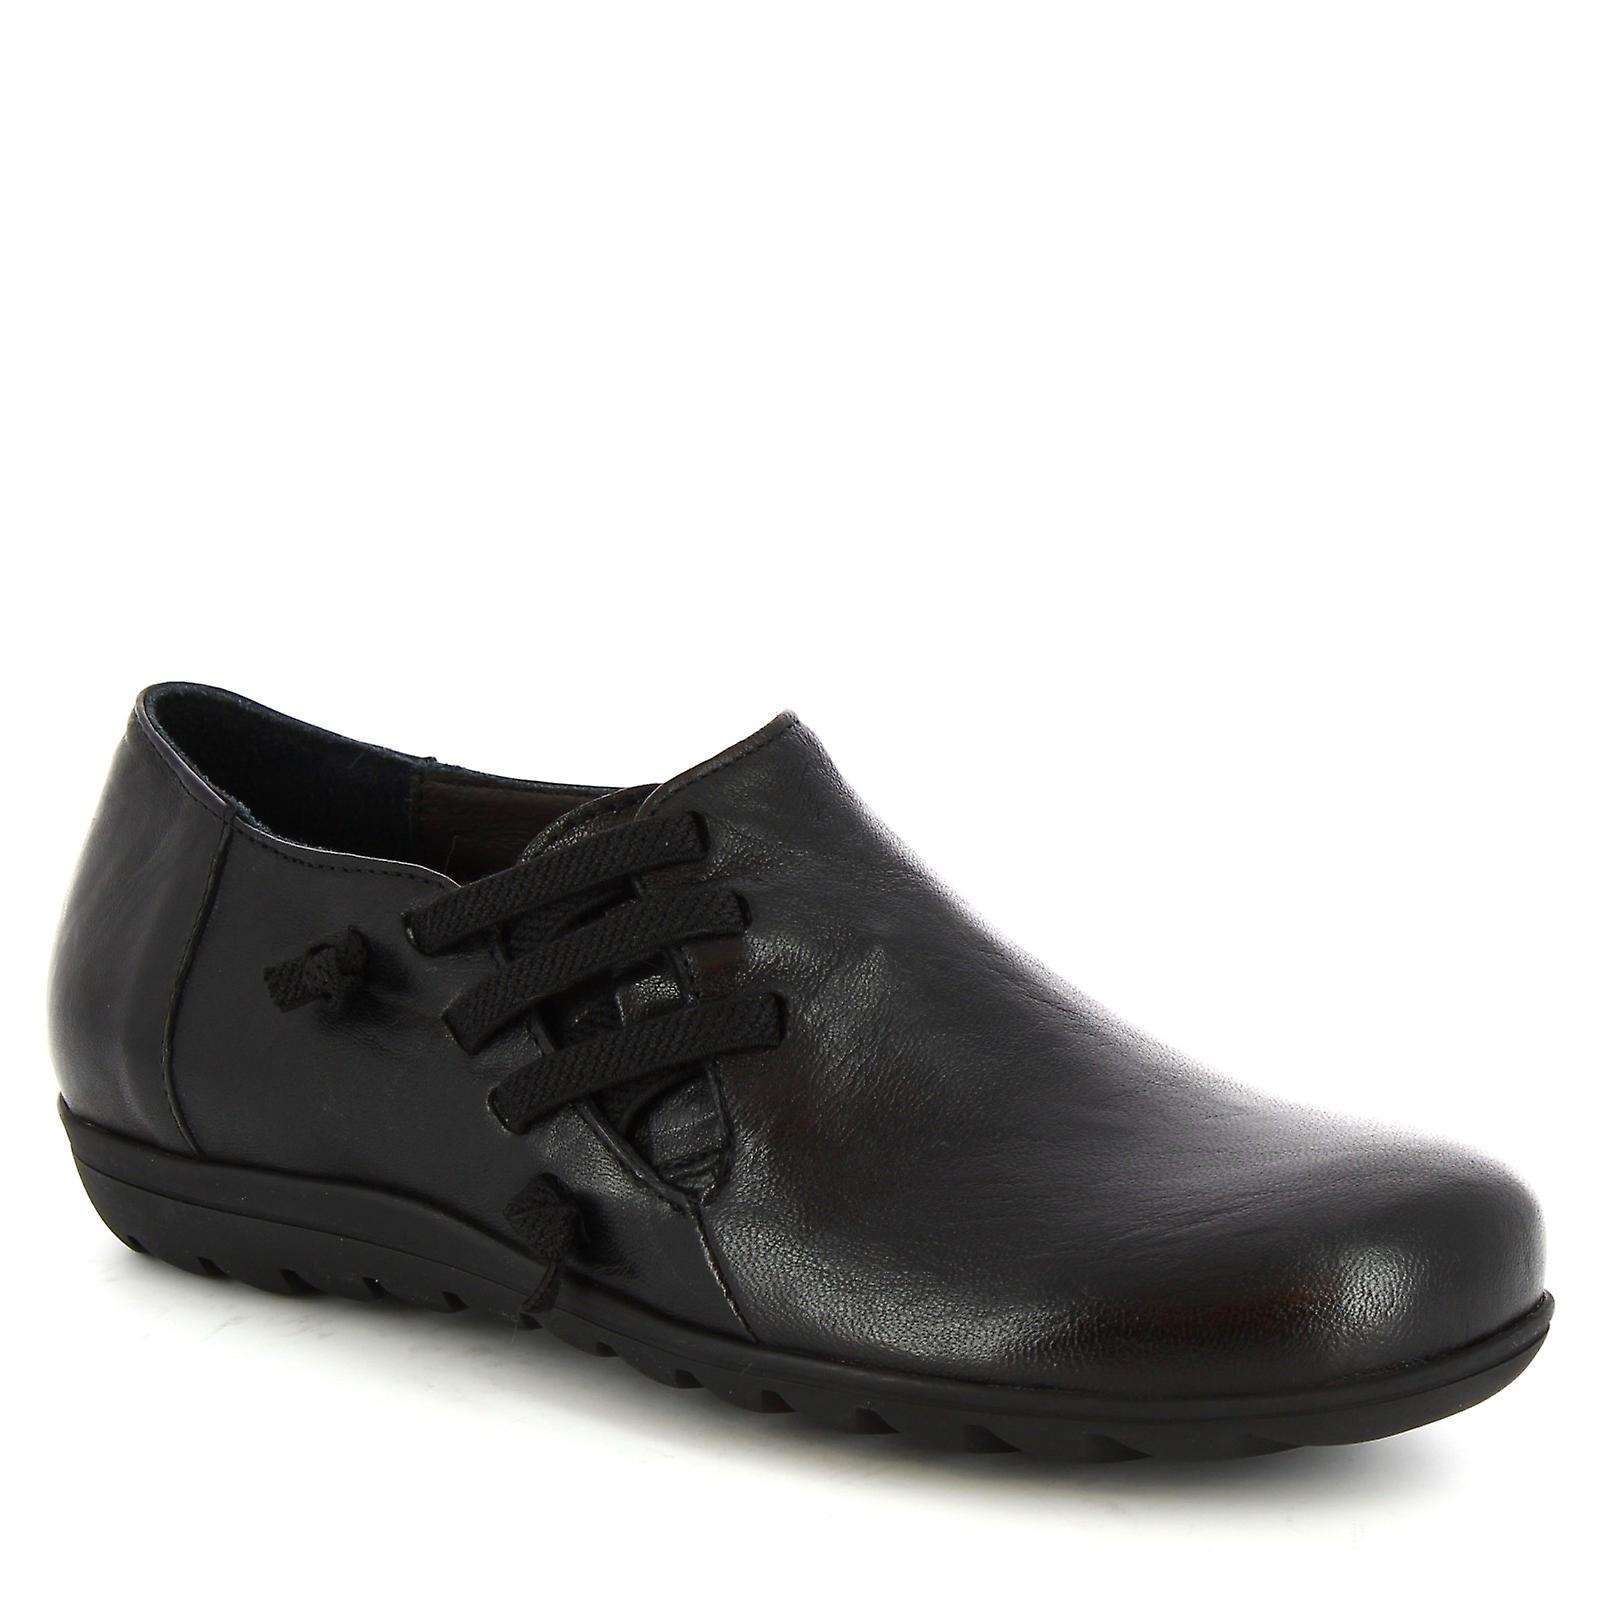 Leonardo Shoes Women's handmade round toe lace-ups shoes black calf leather